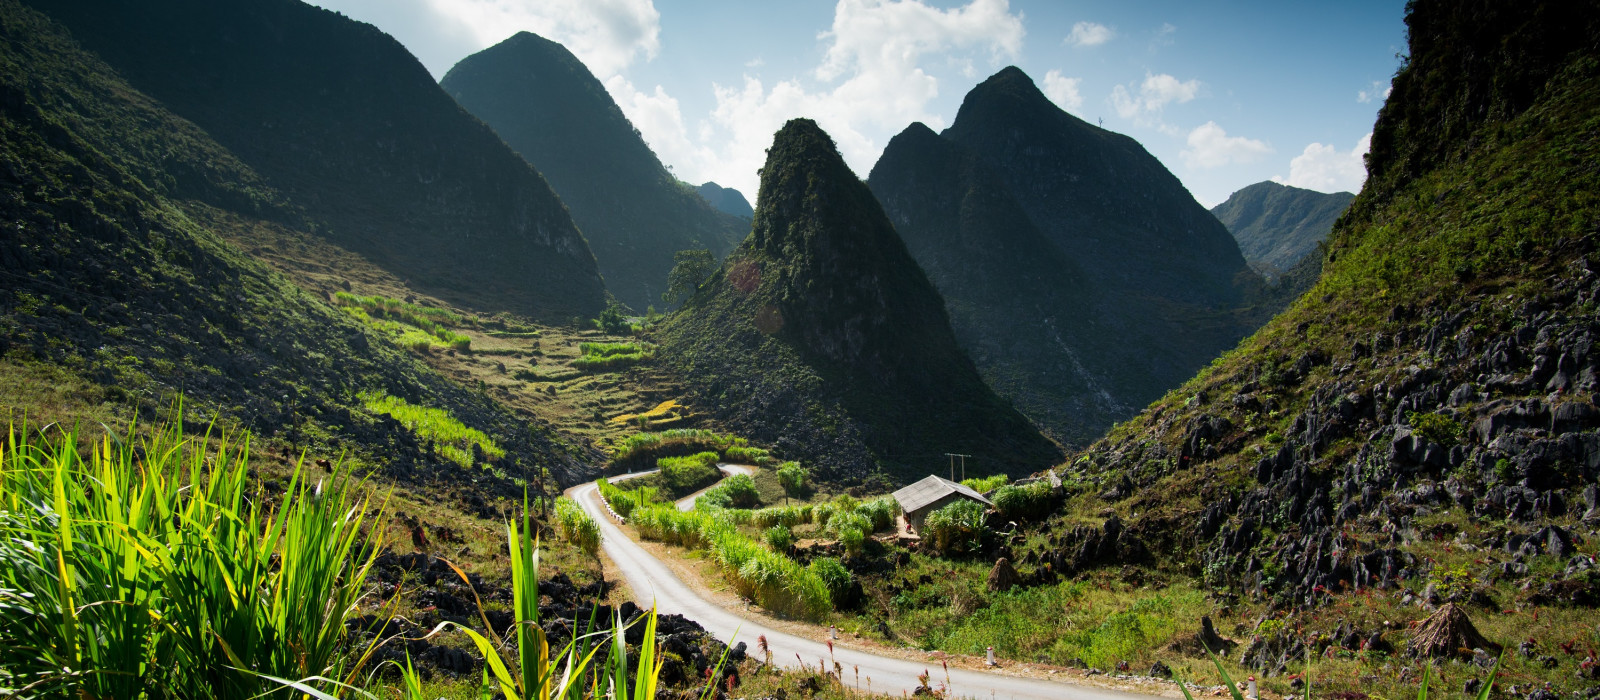 Destination Dong Van Vietnam